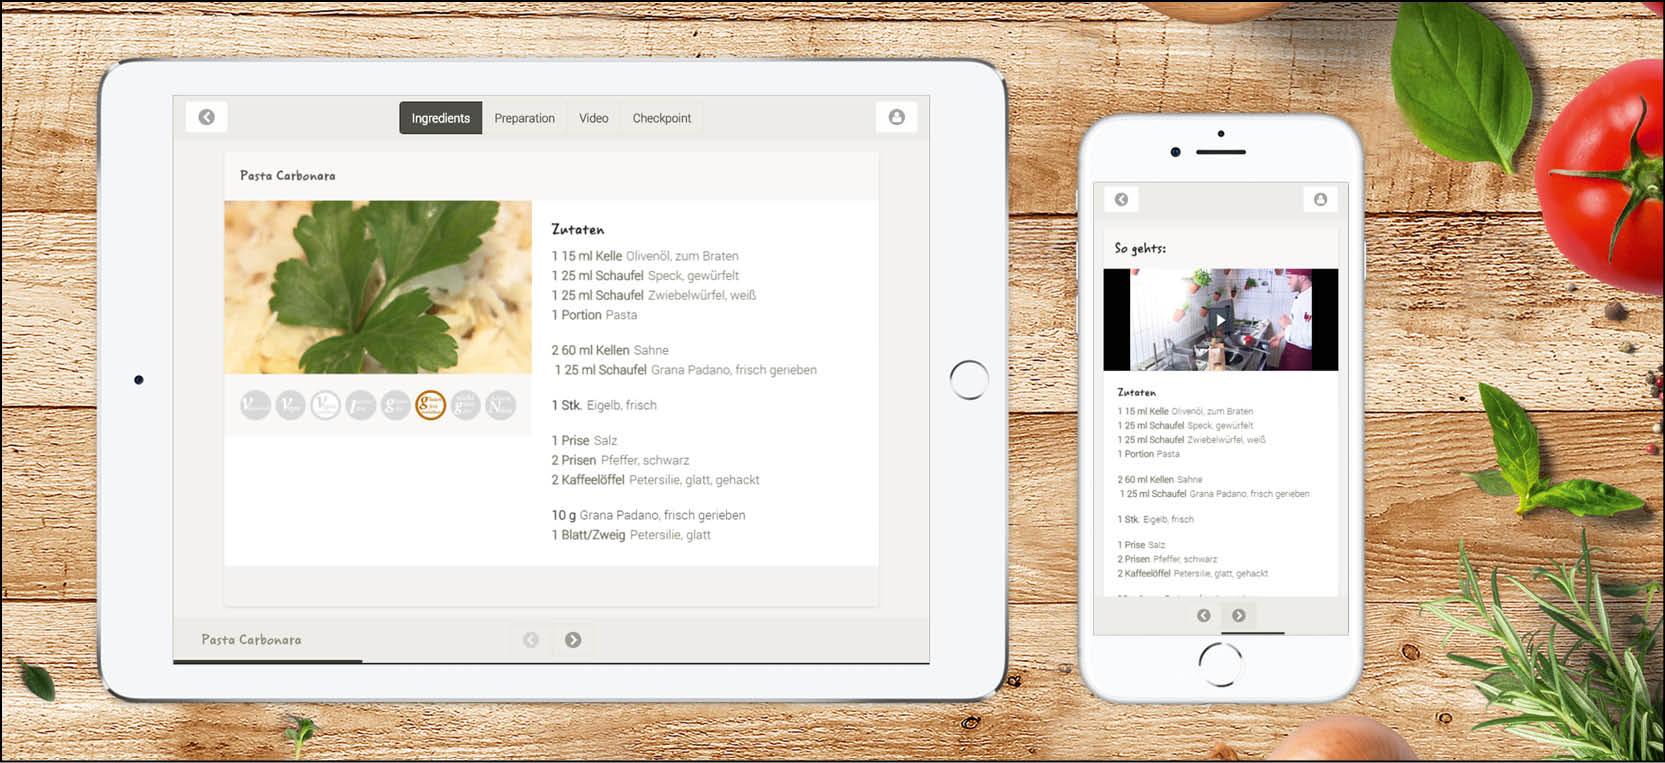 Vapiano: Mit Mobile Learning und dem eAuthor auf Expansionskurs